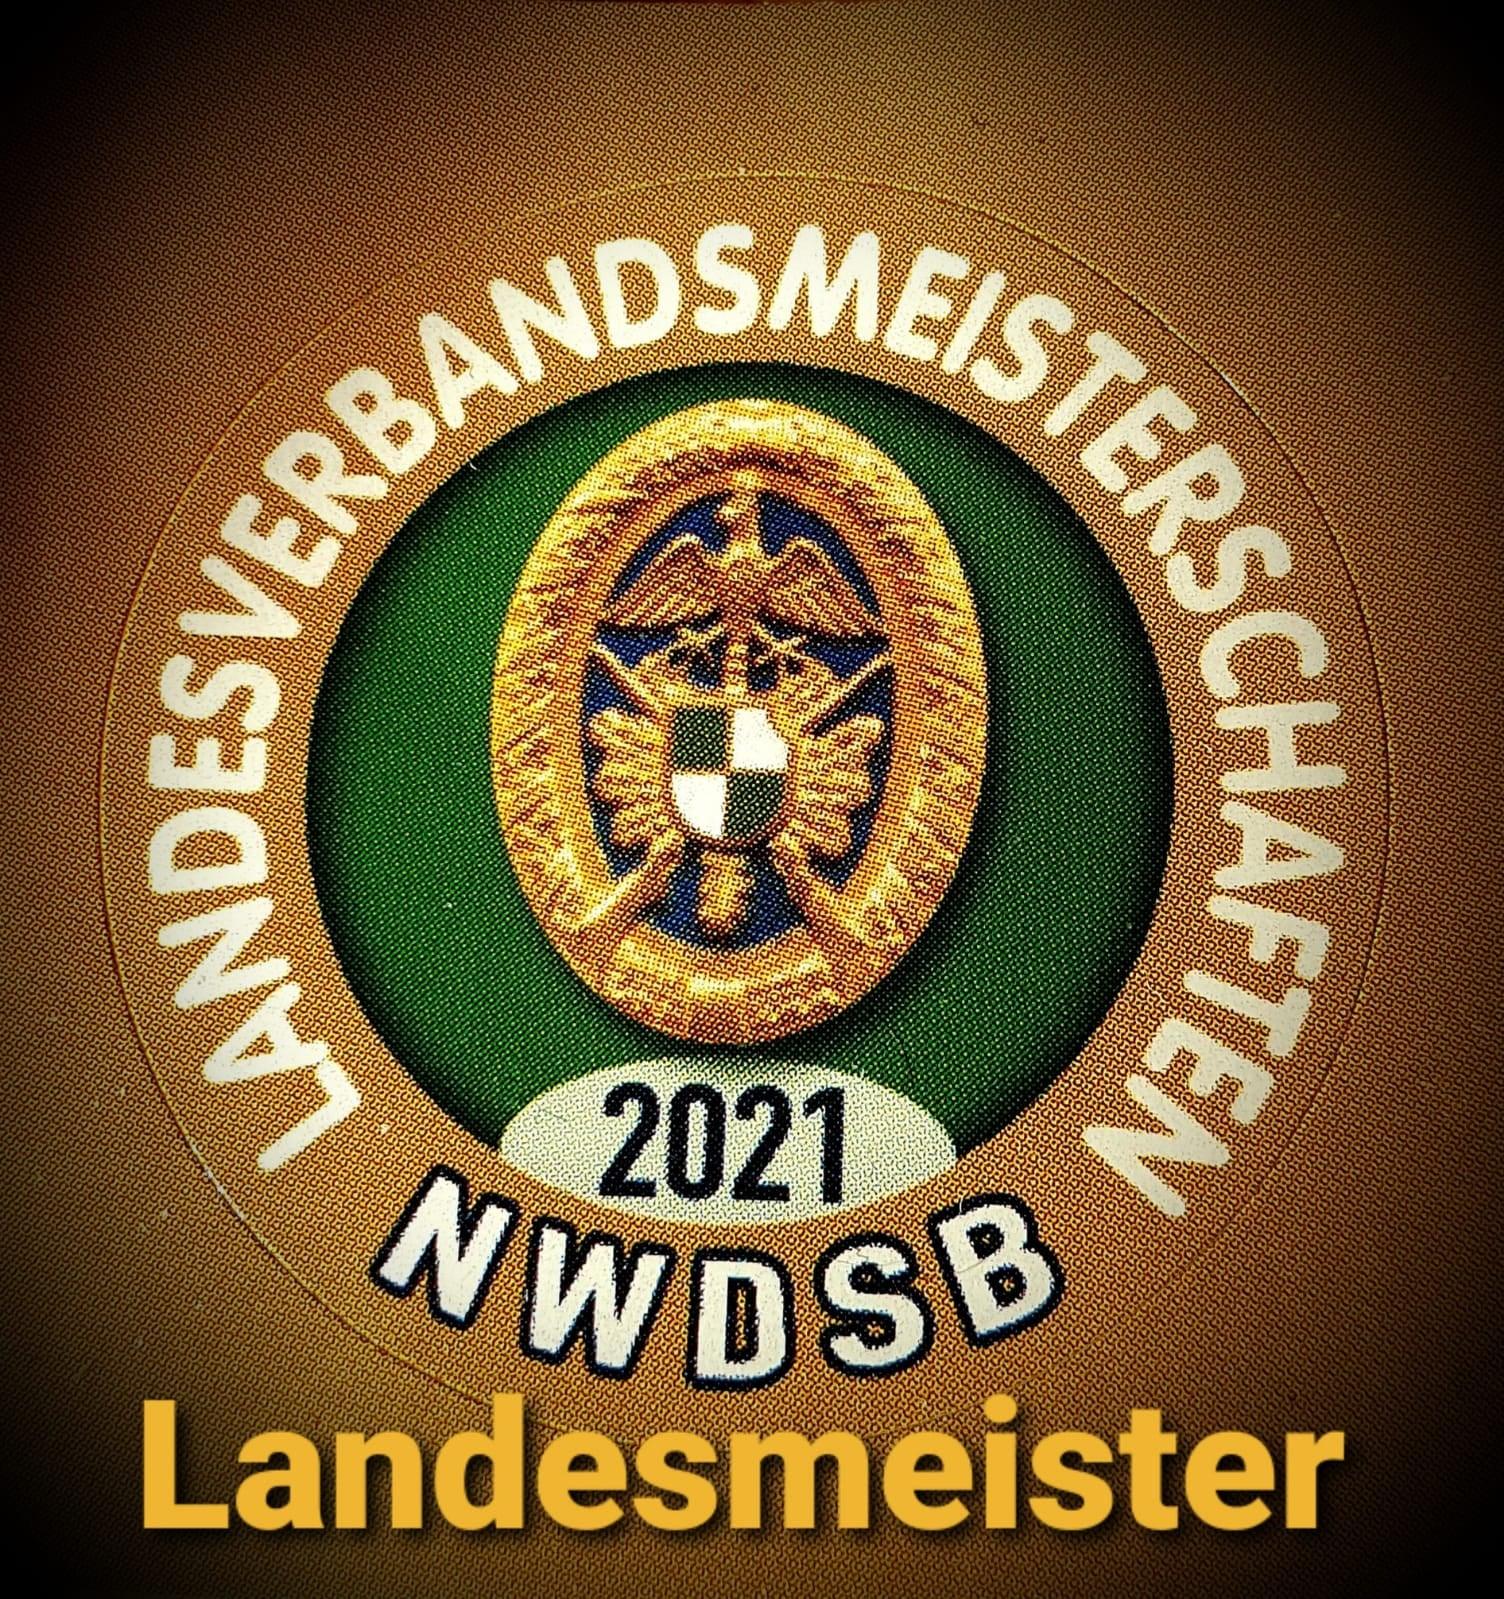 Landesmeister-2021-Dieter-Oehlschlaeger